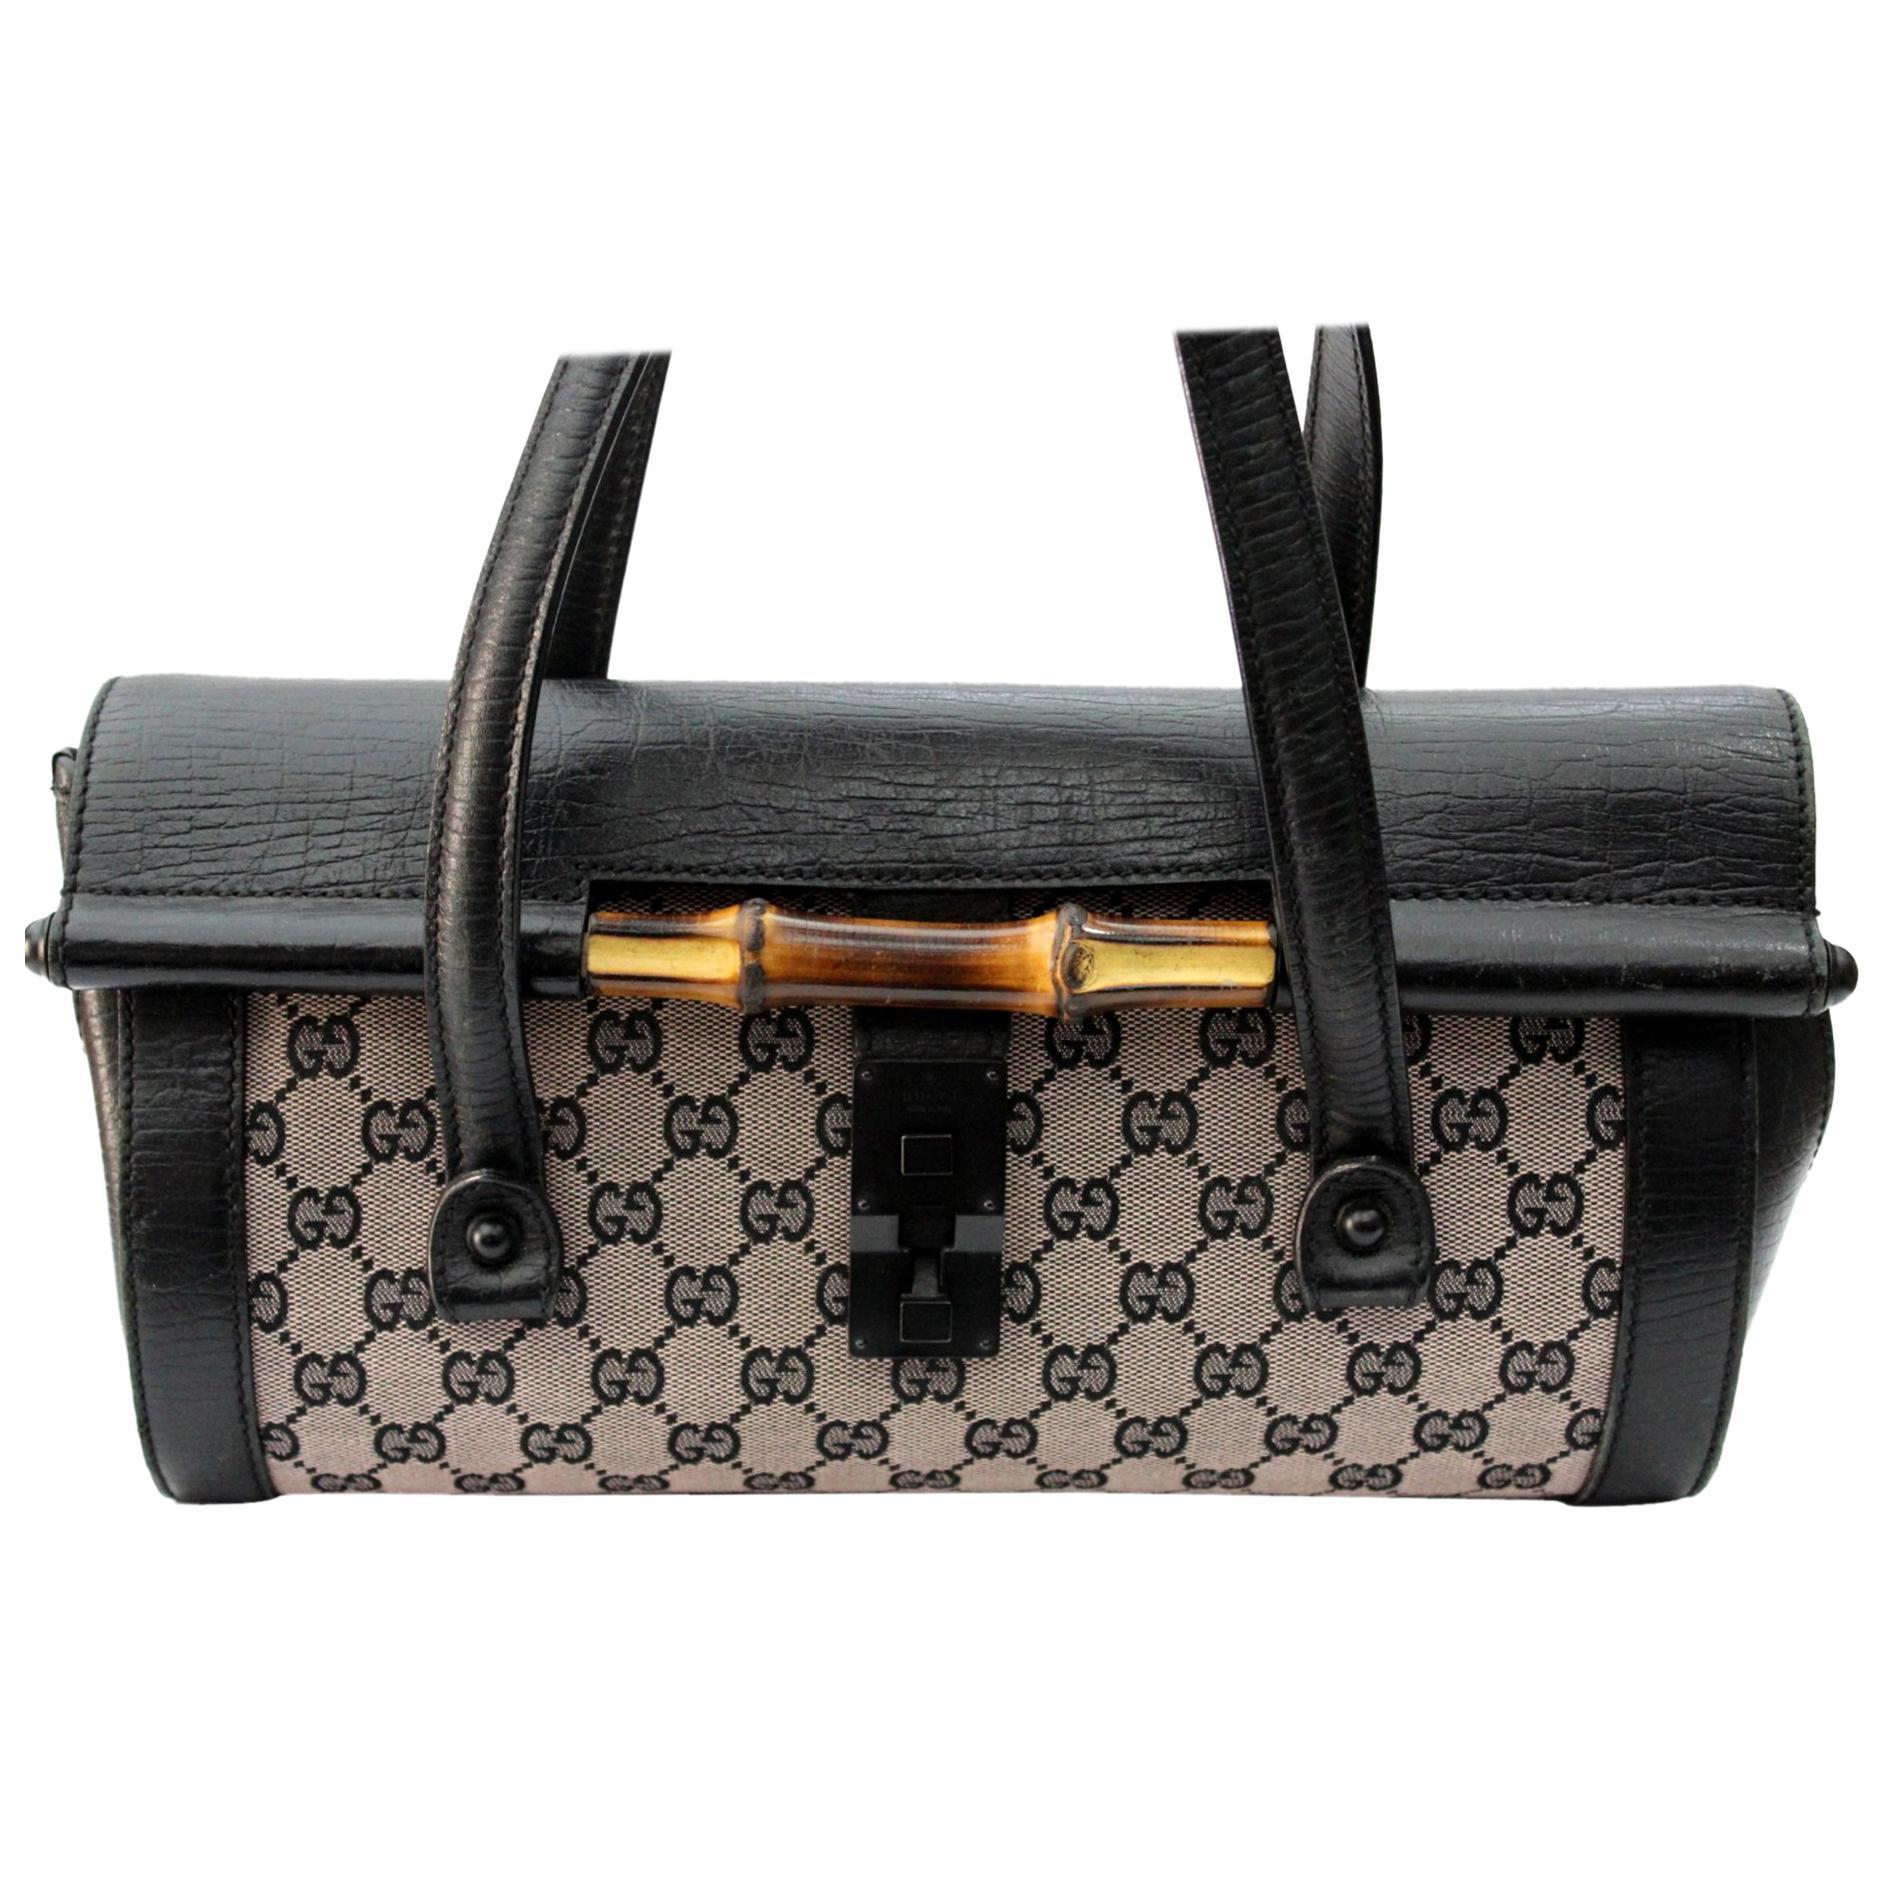 Gucci Bamboo Bullet Bag